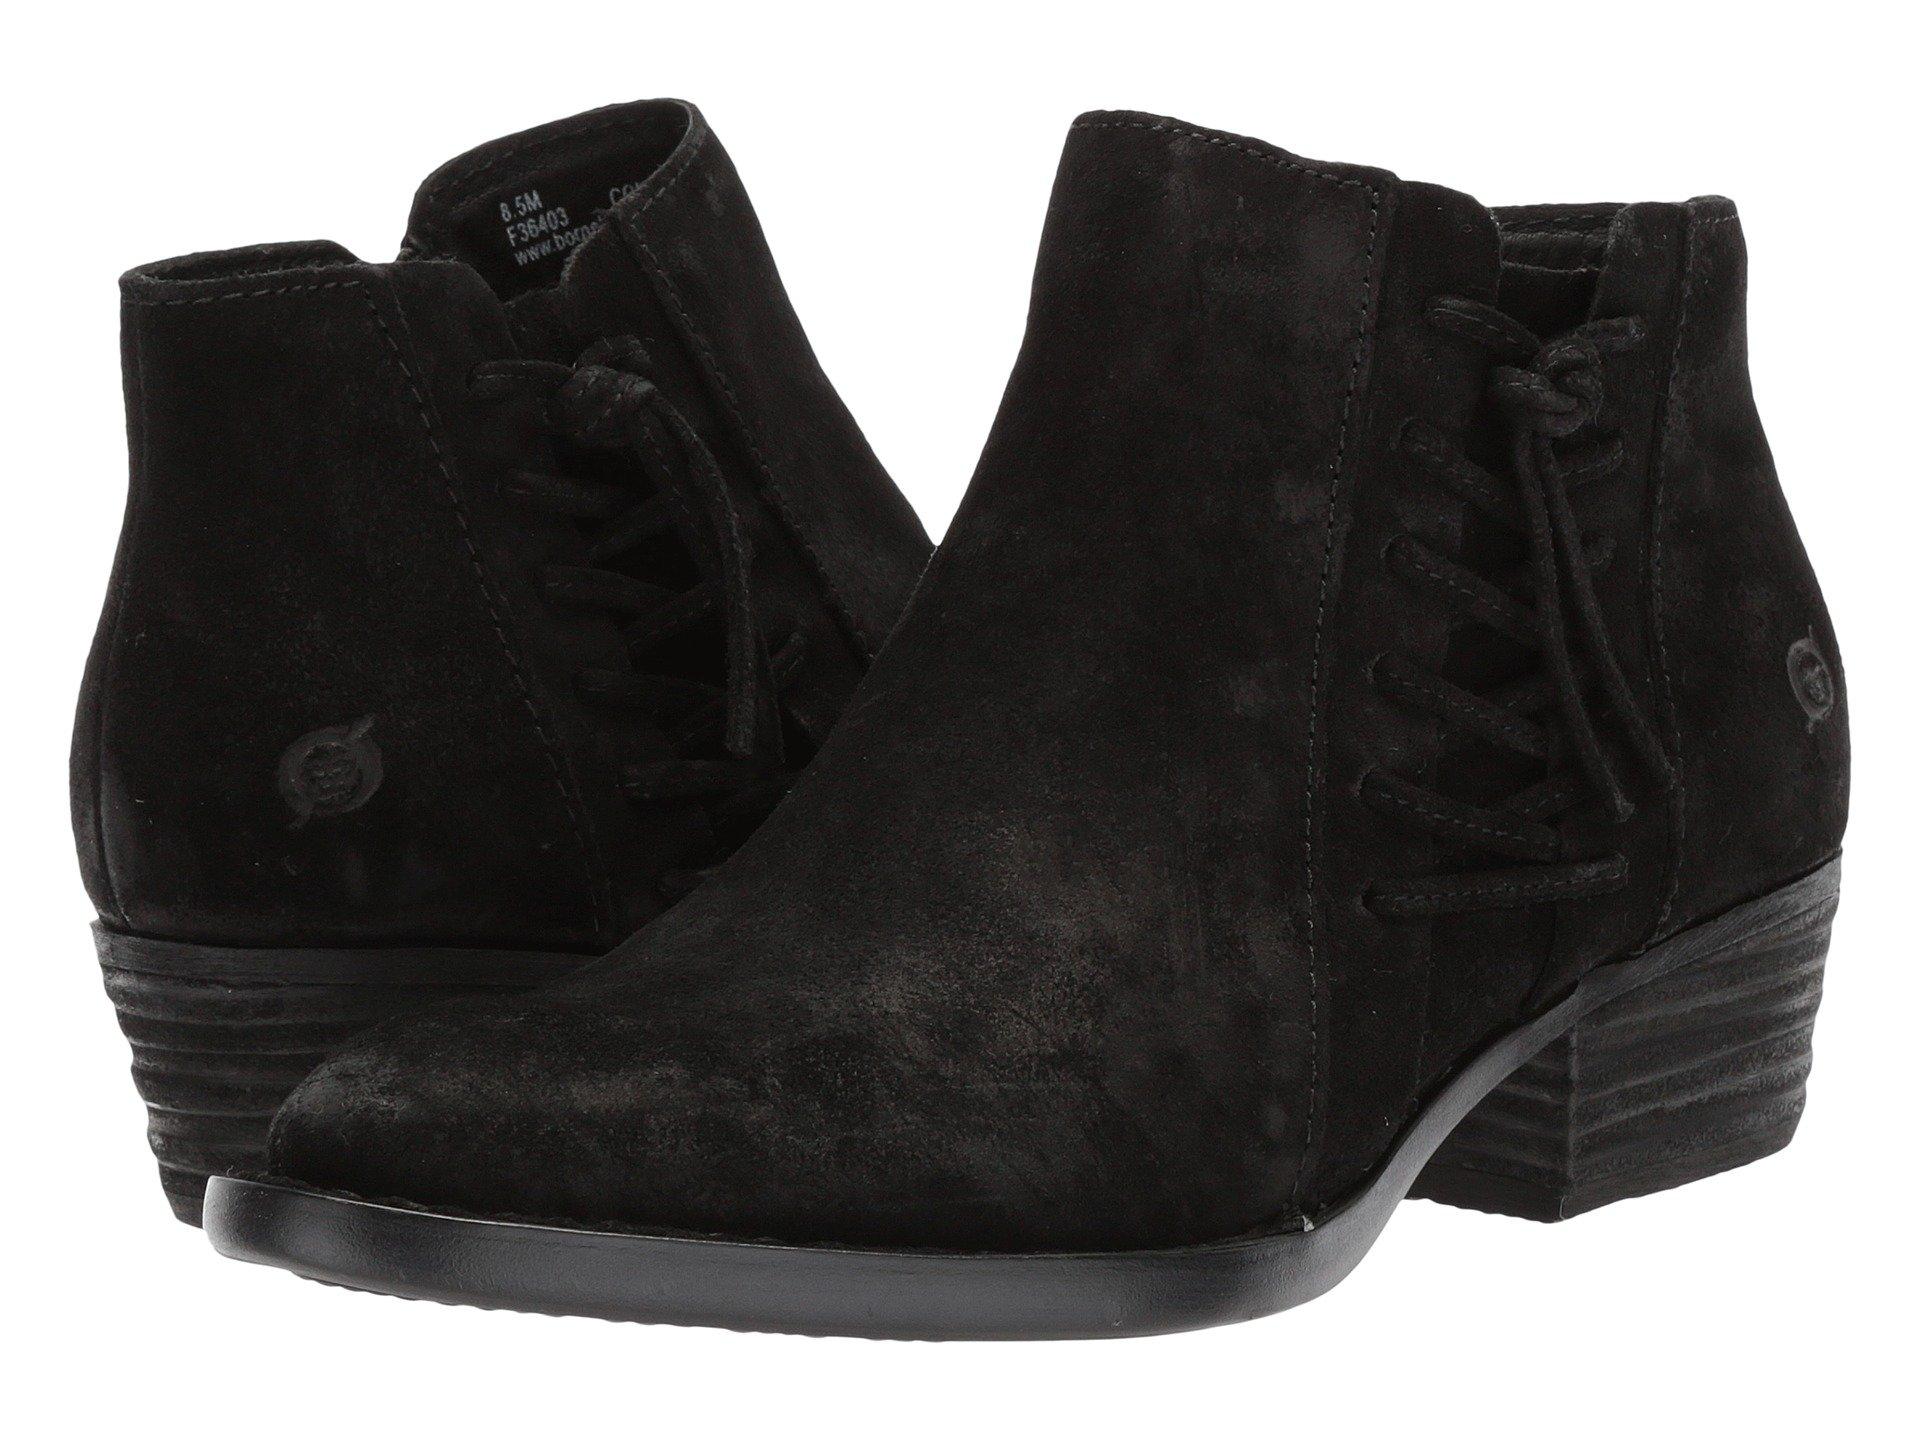 1d9b7b2c22 Women's Born Boots + FREE SHIPPING | Shoes | Zappos.com